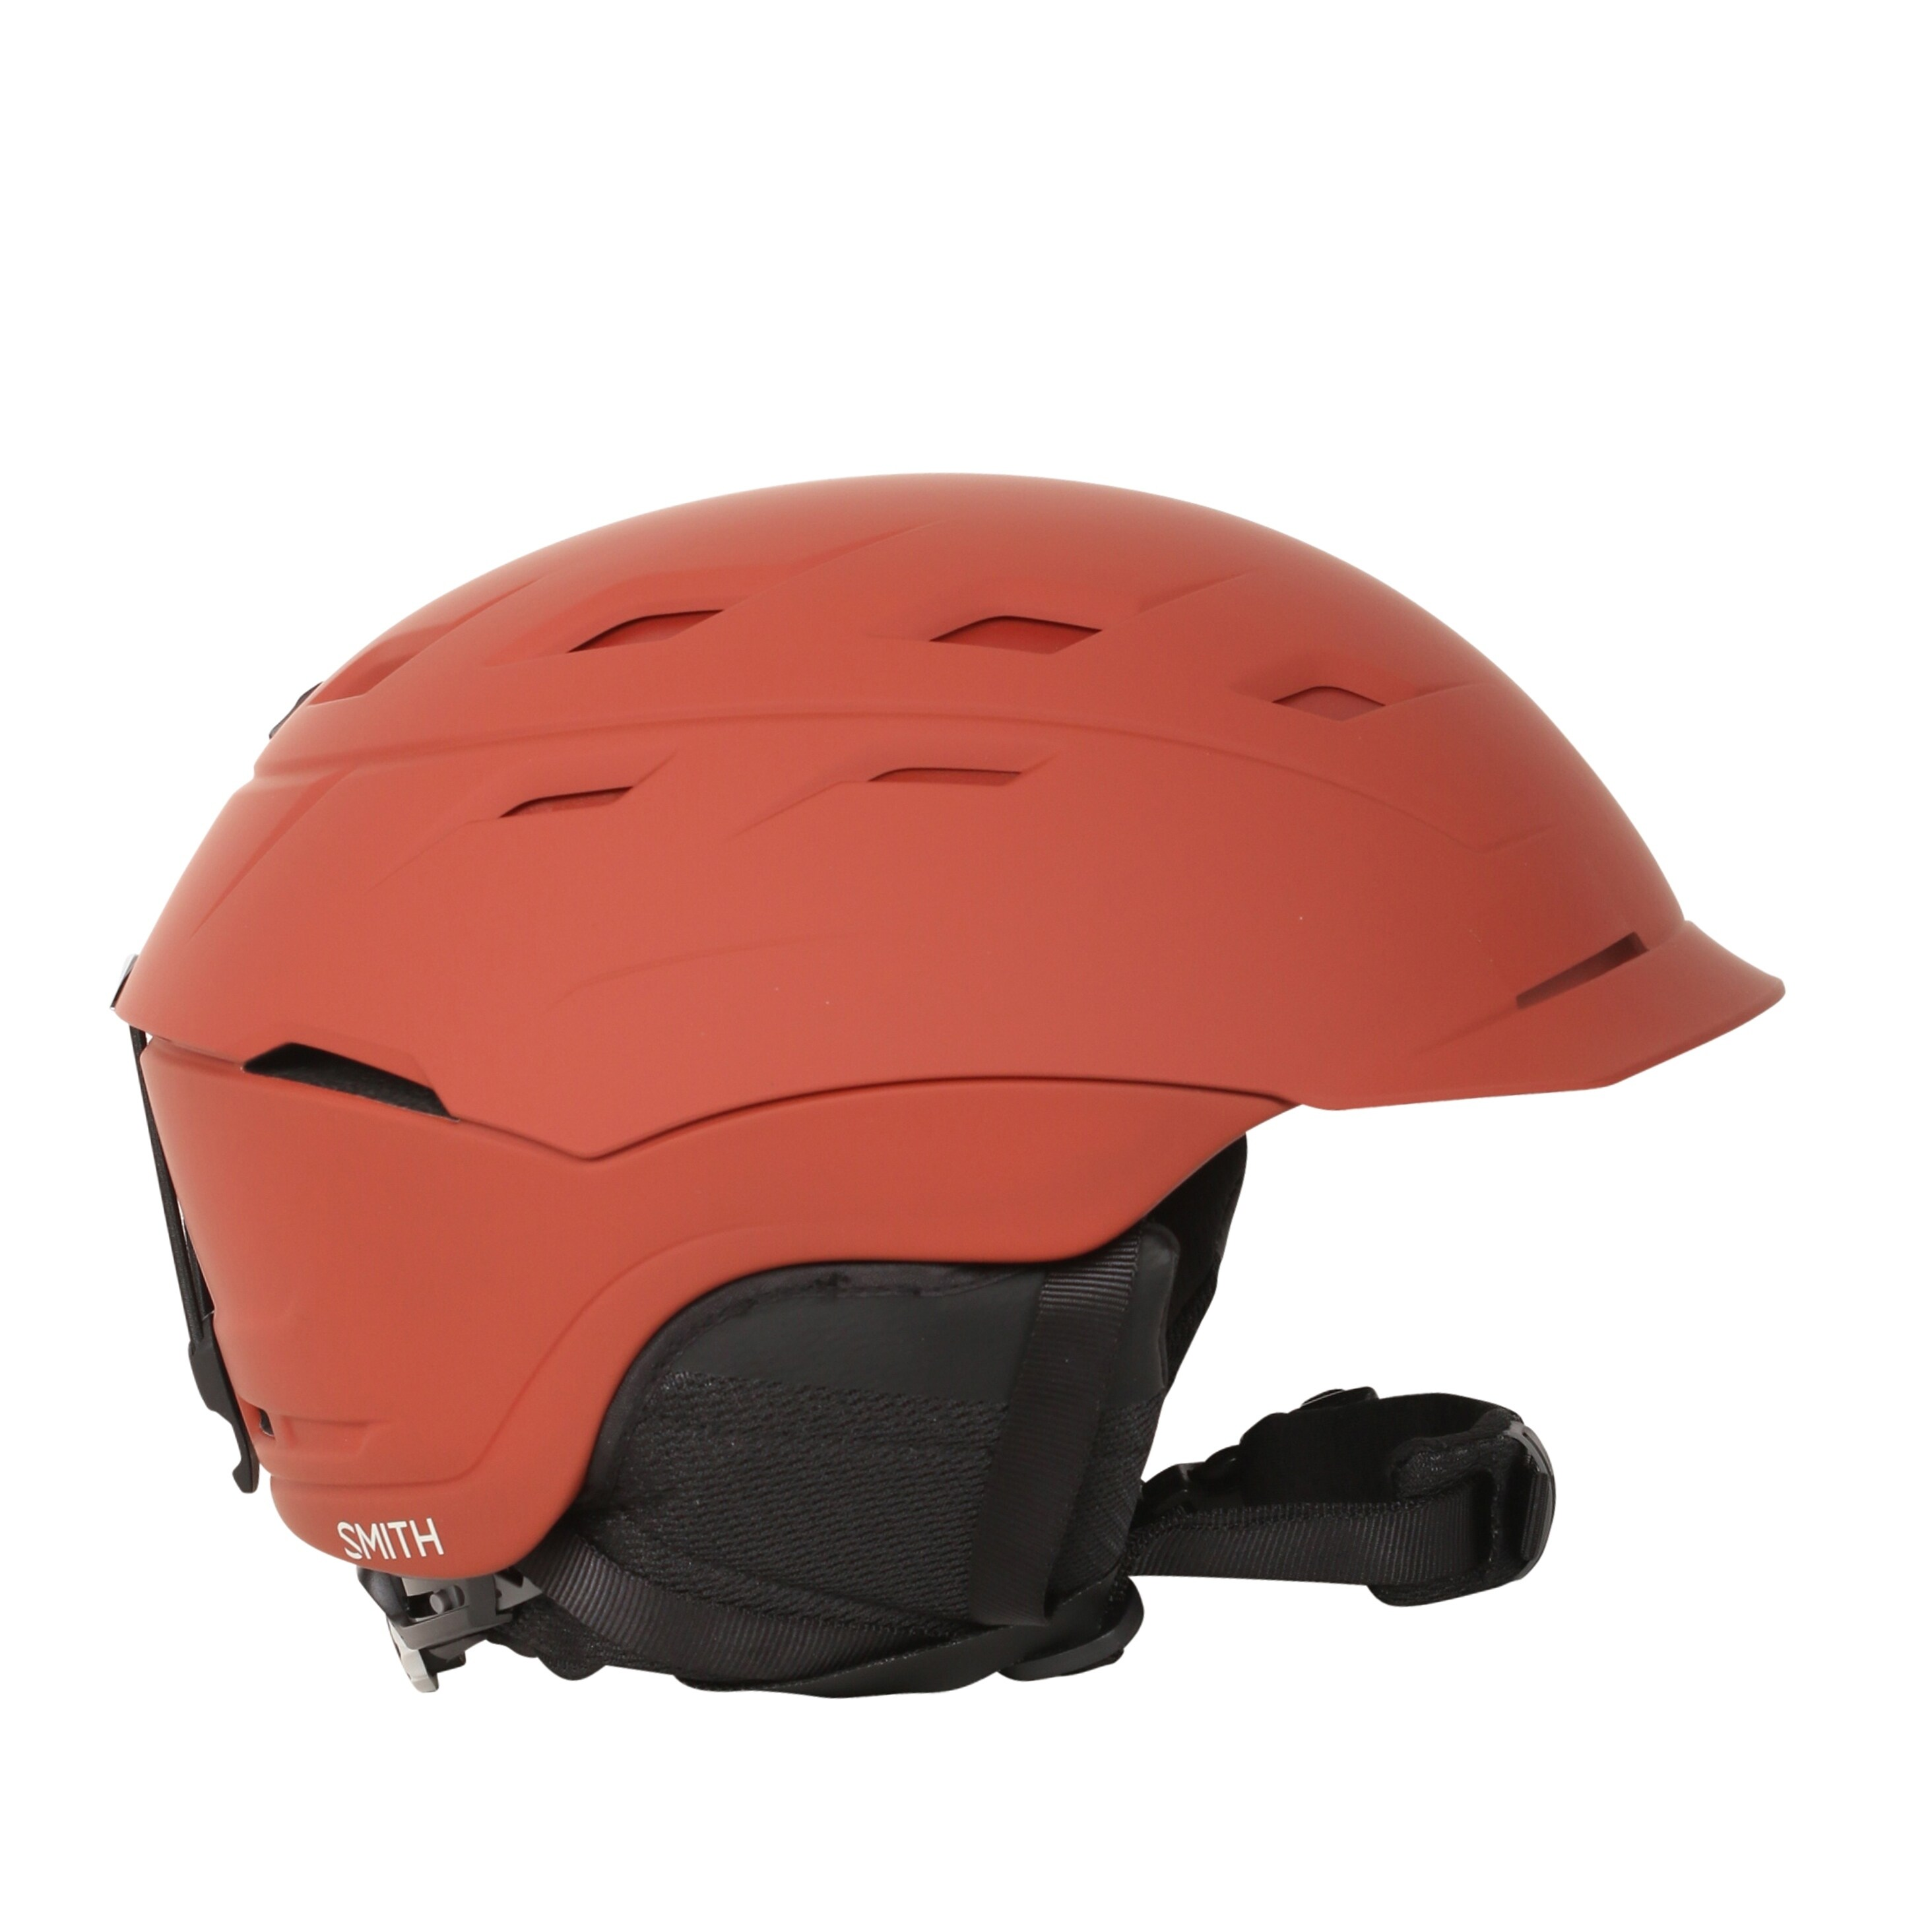 5721078795b69 Shop Smith Optics Variance Matte Adobe MIPS Ski Snowboard Helmet - Red - Free  Shipping Today - Overstock - 18076408